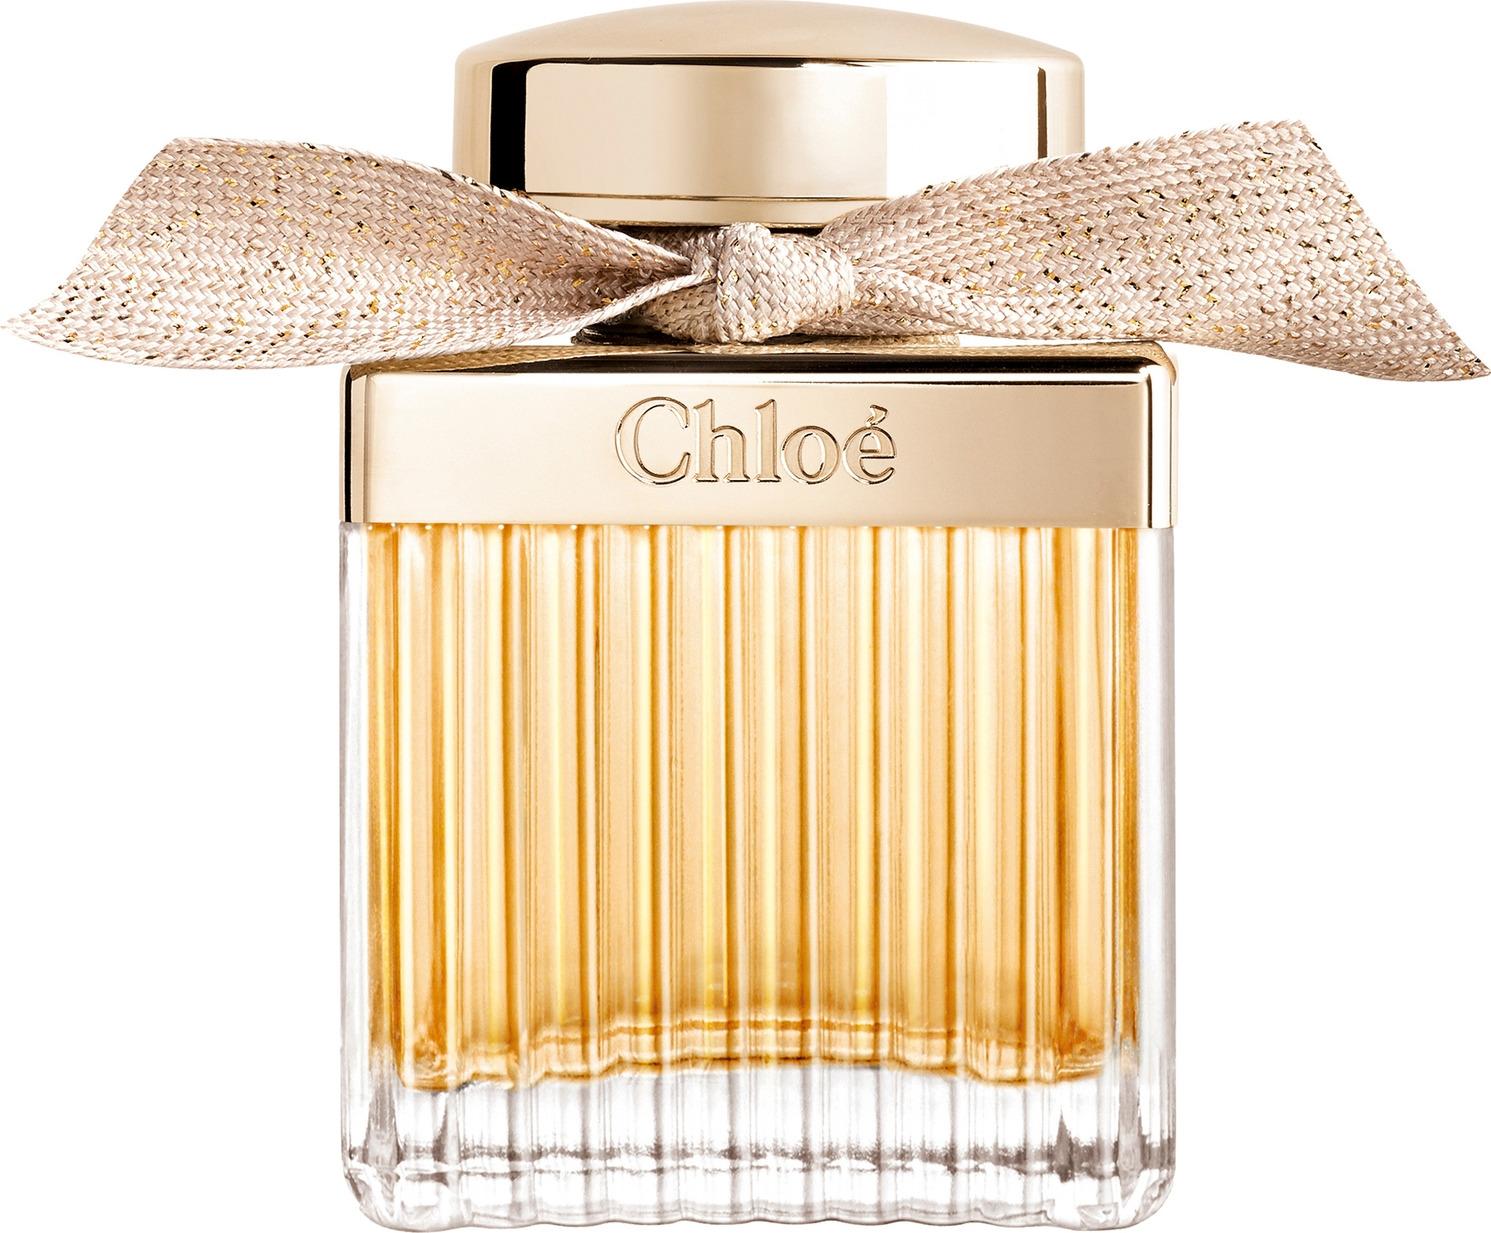 Chloe Signature Absolu de Parfum 75 мл chloe signature absolu de parfum 30 мл